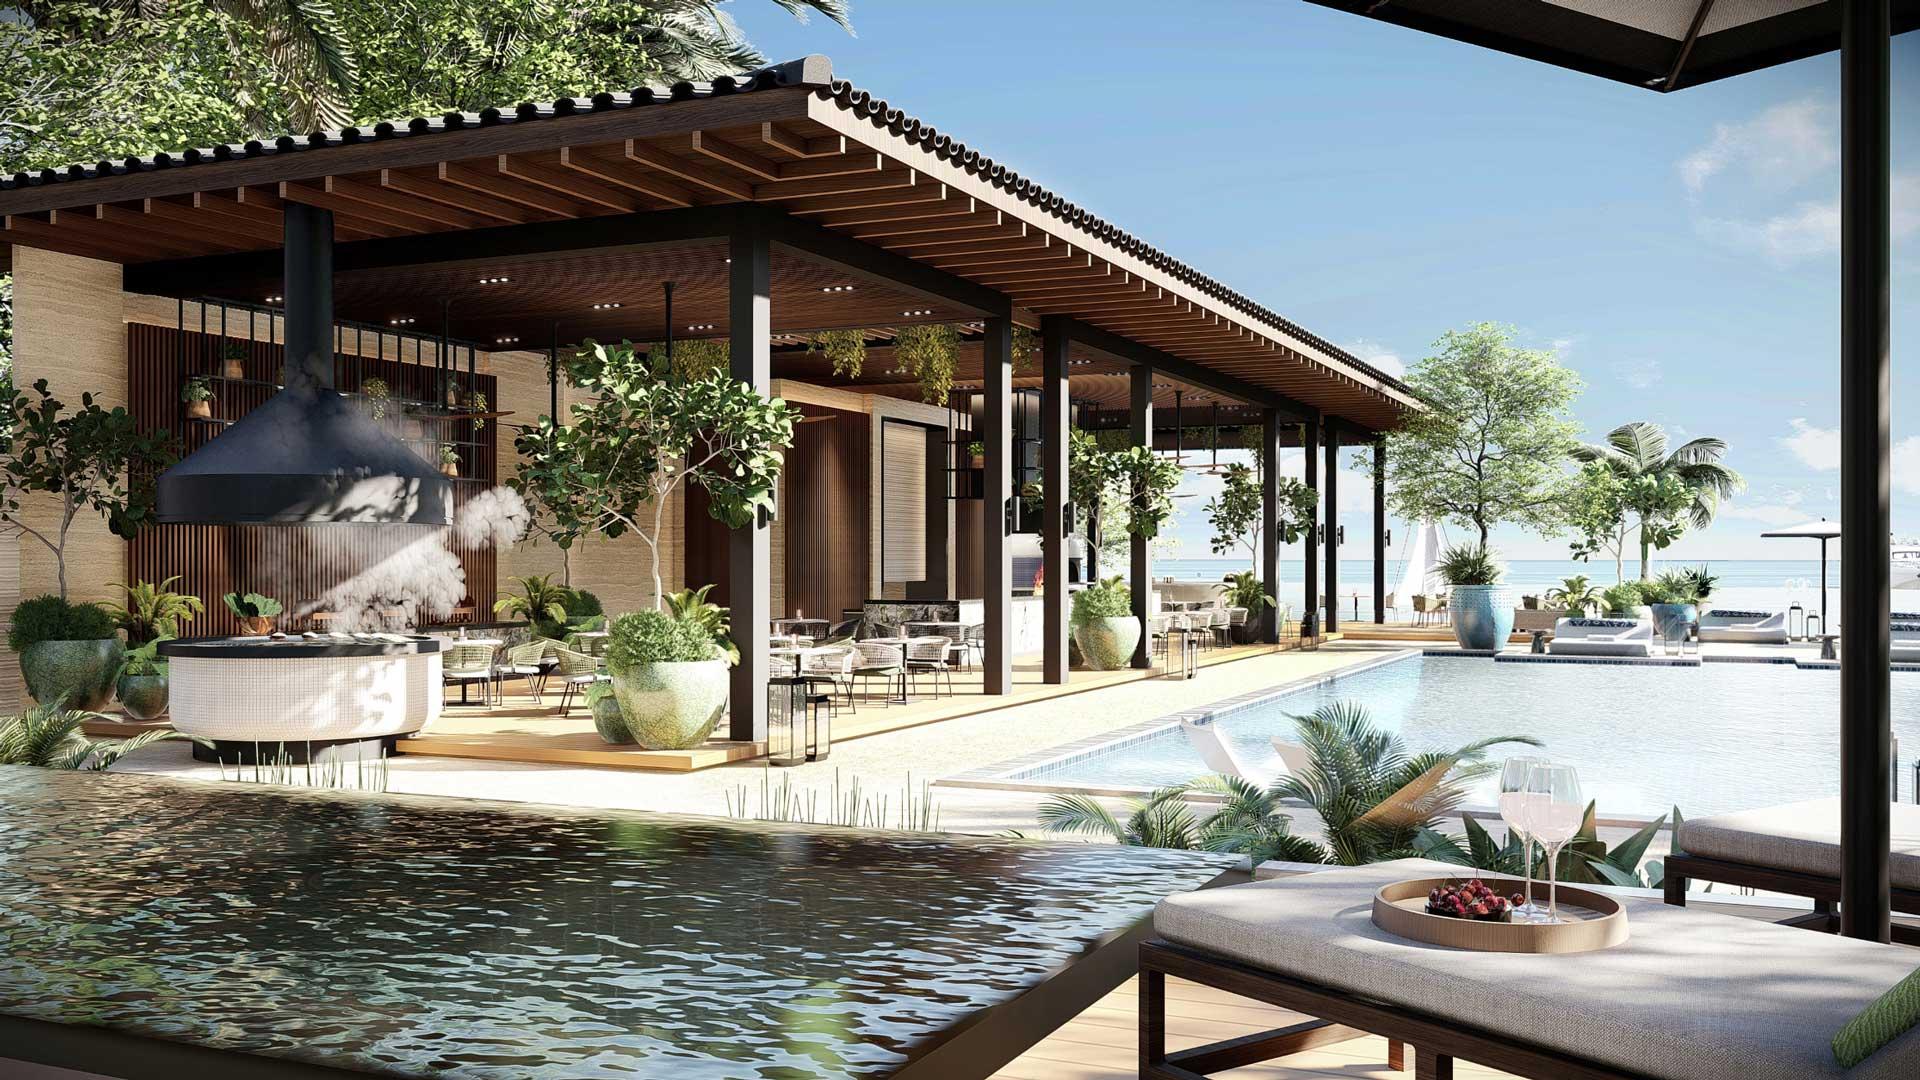 Luxurious resort hotel pools and cabana